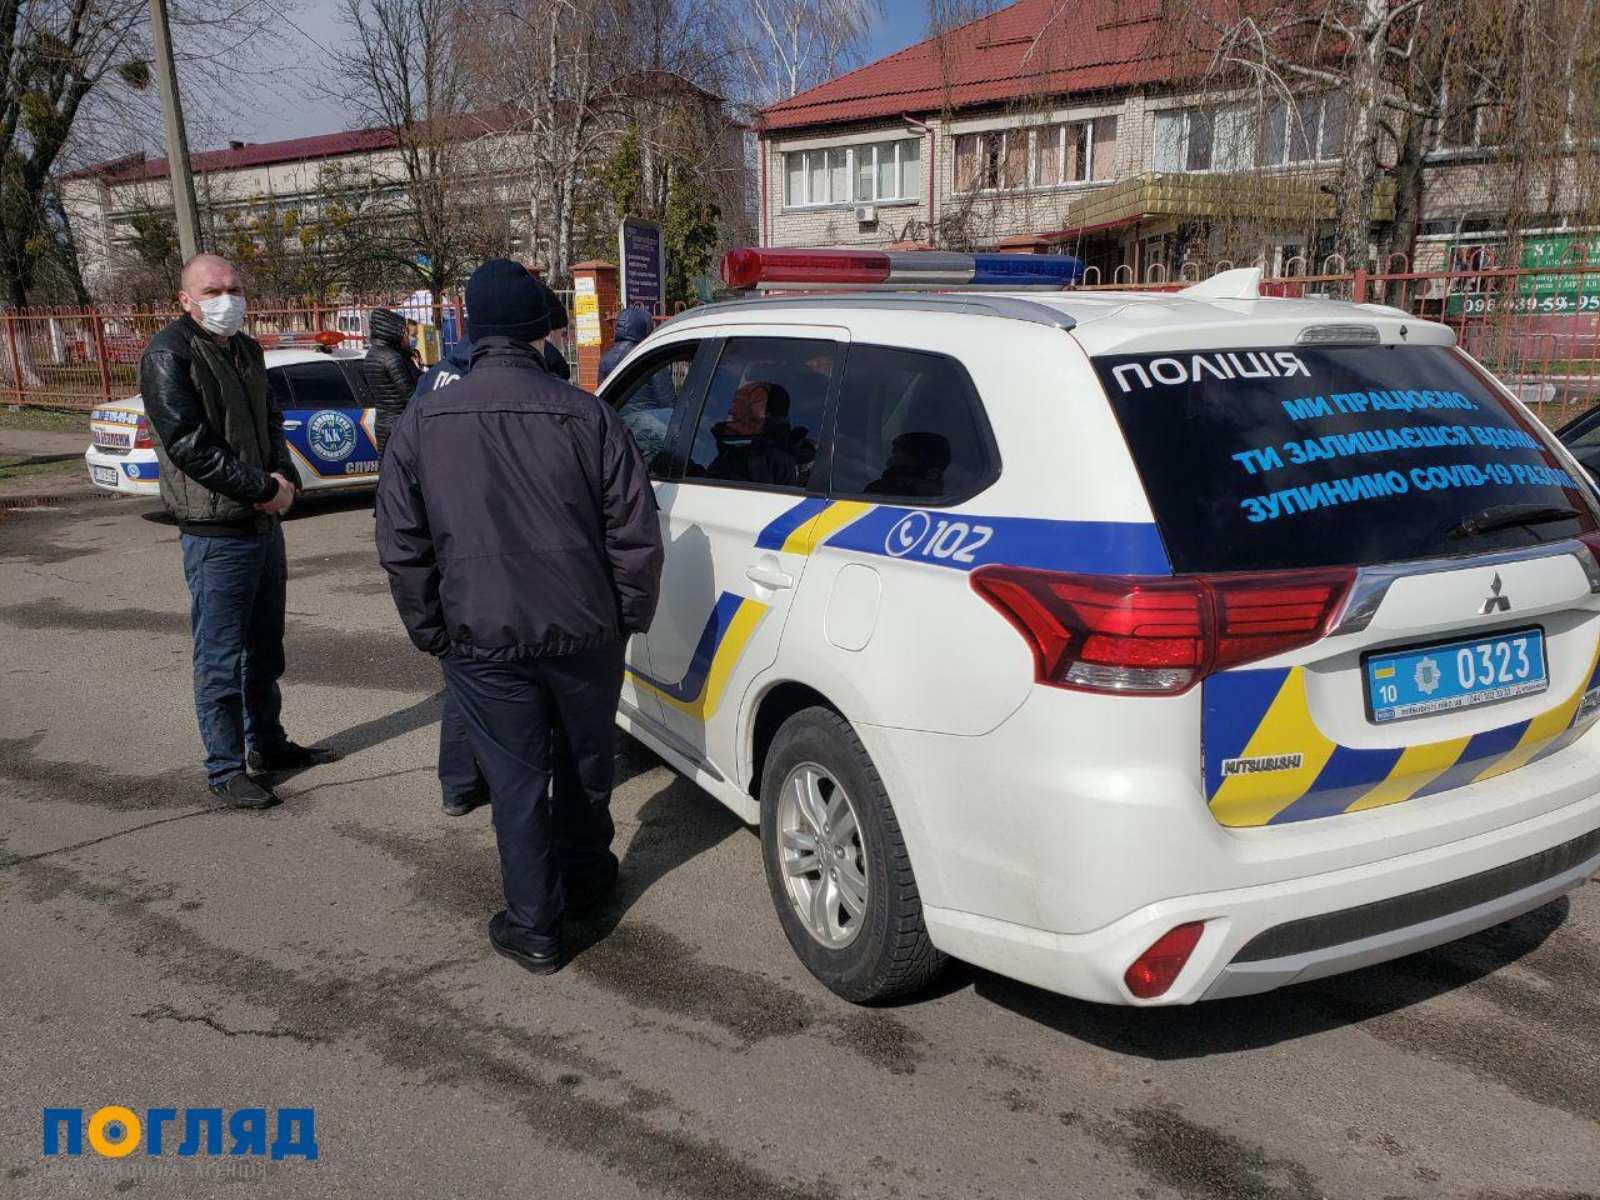 Через паркан швидше: у Броварах затримали порушника правил карантину -  - yzobrazhenye viber 2020 03 31 15 44 41